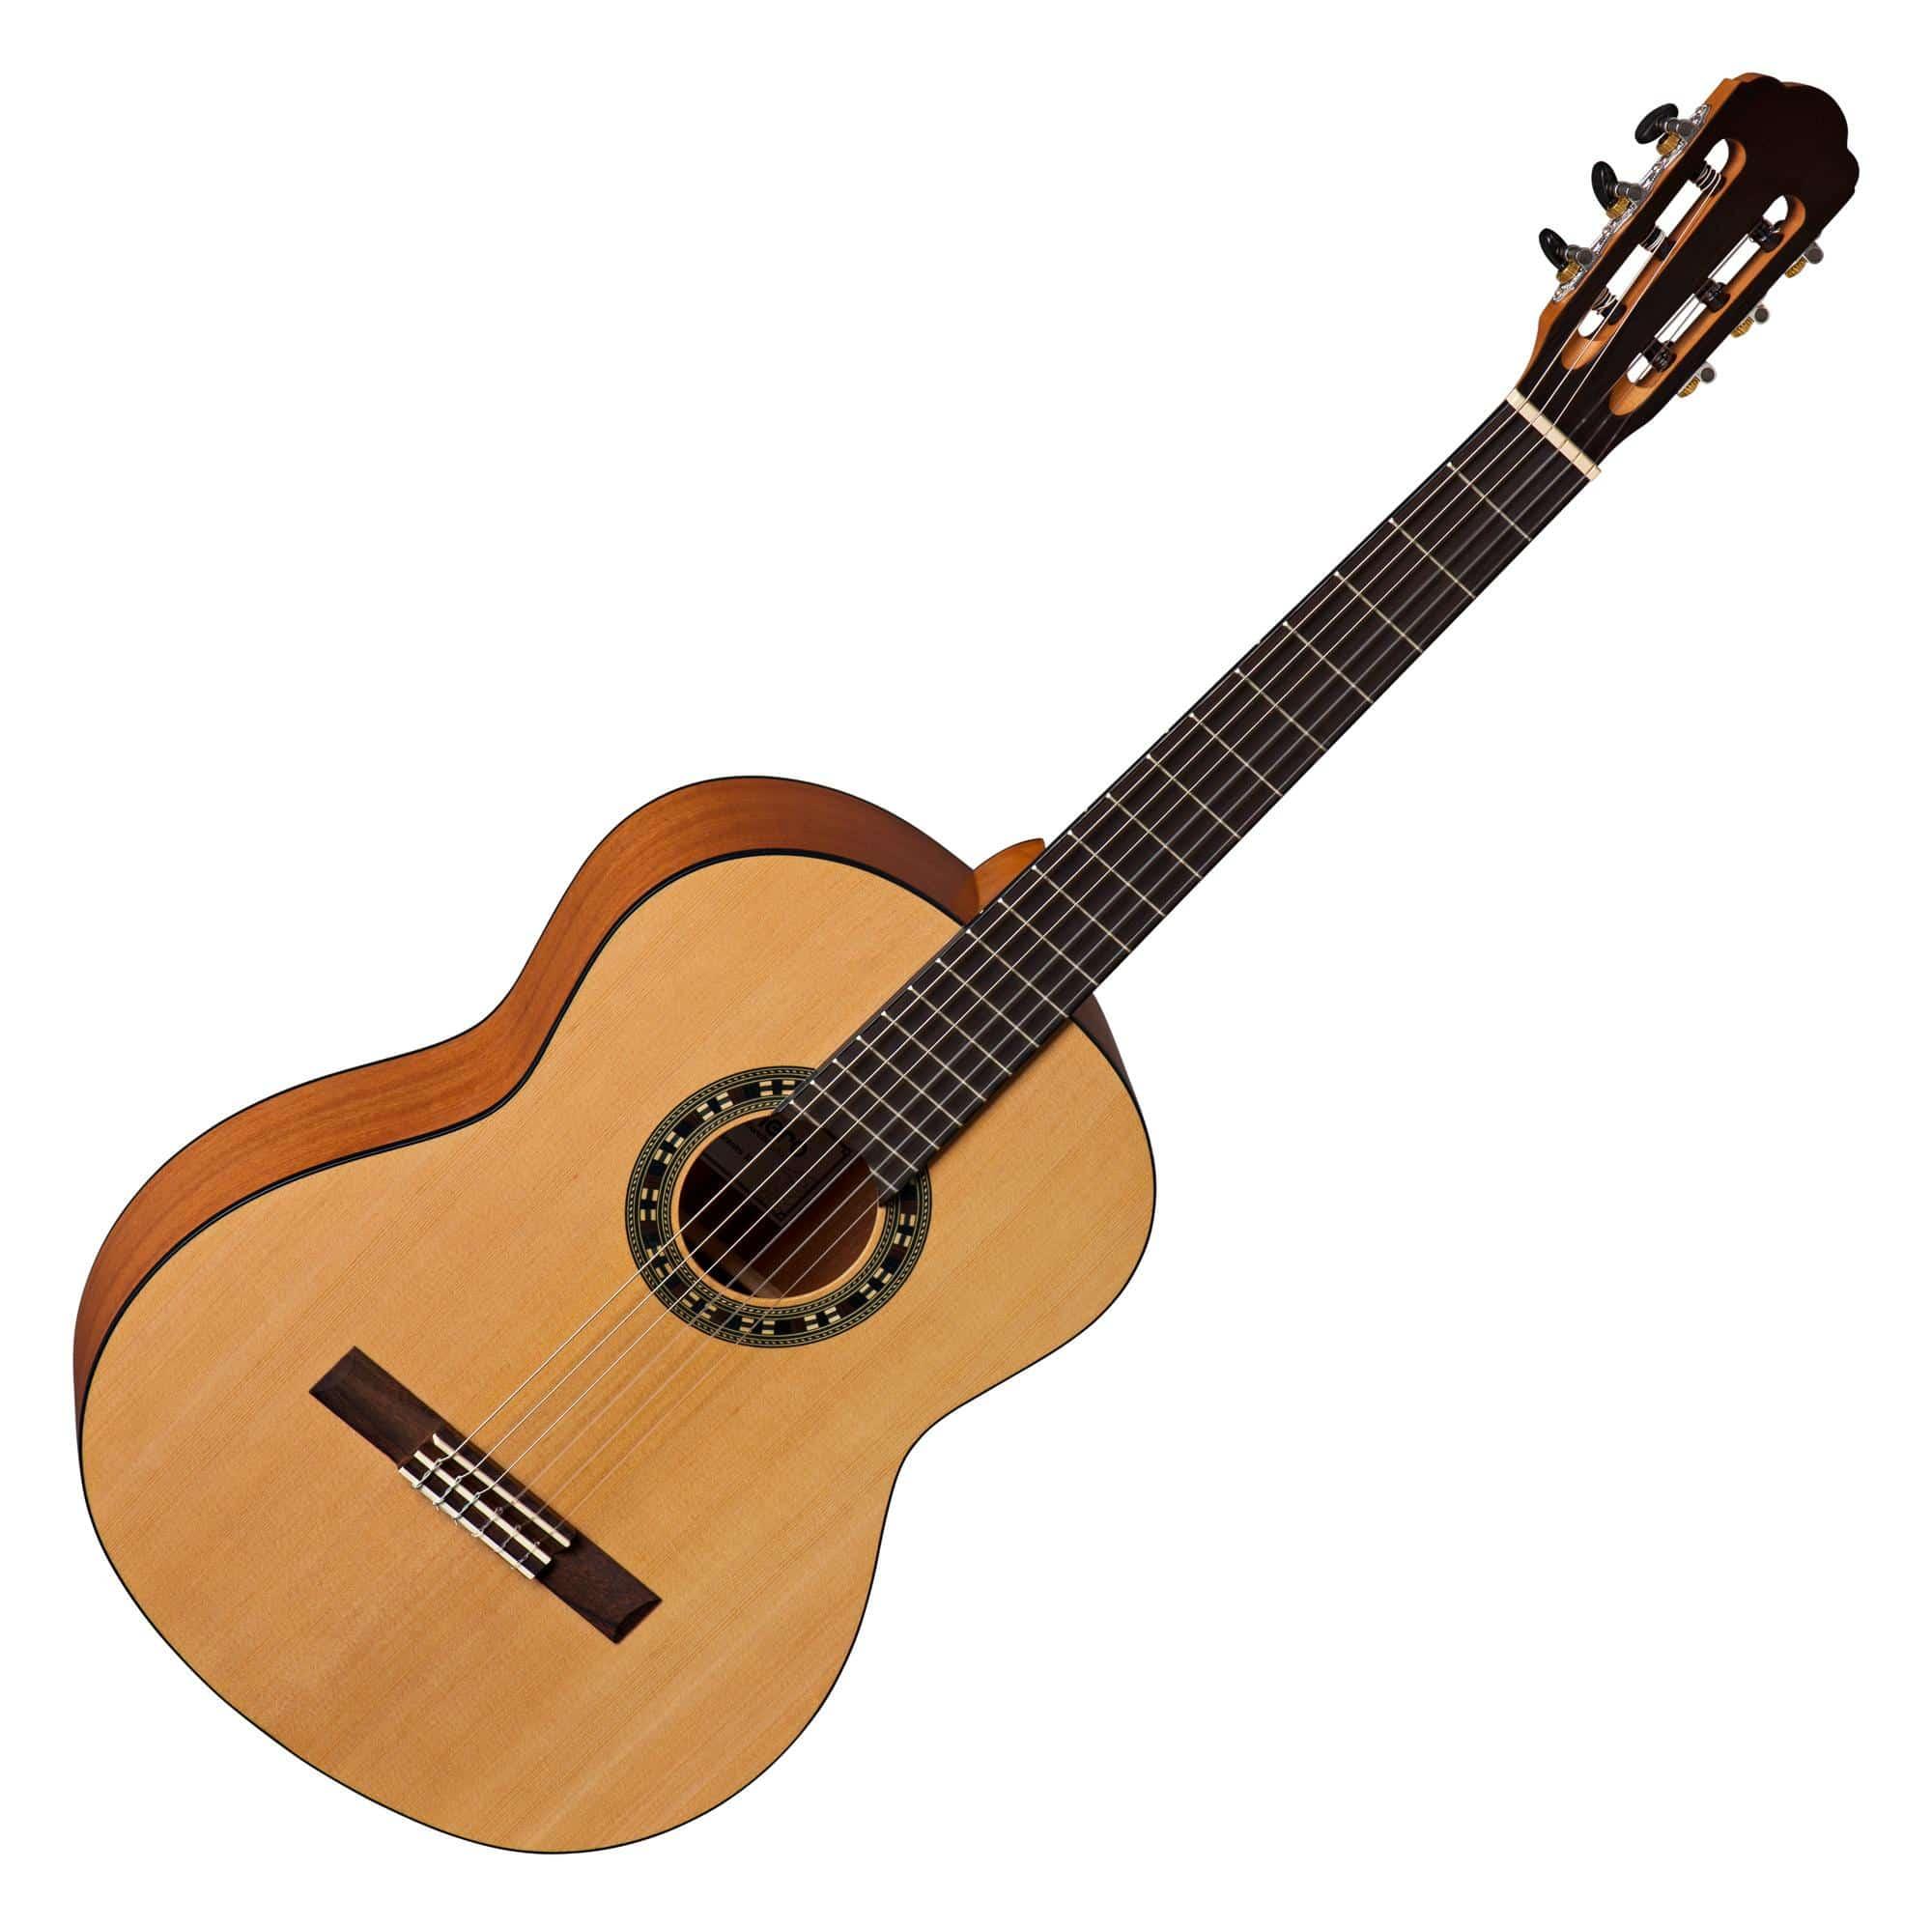 Romero by La Mancha Granito 32 1 2 Konzertgitarre